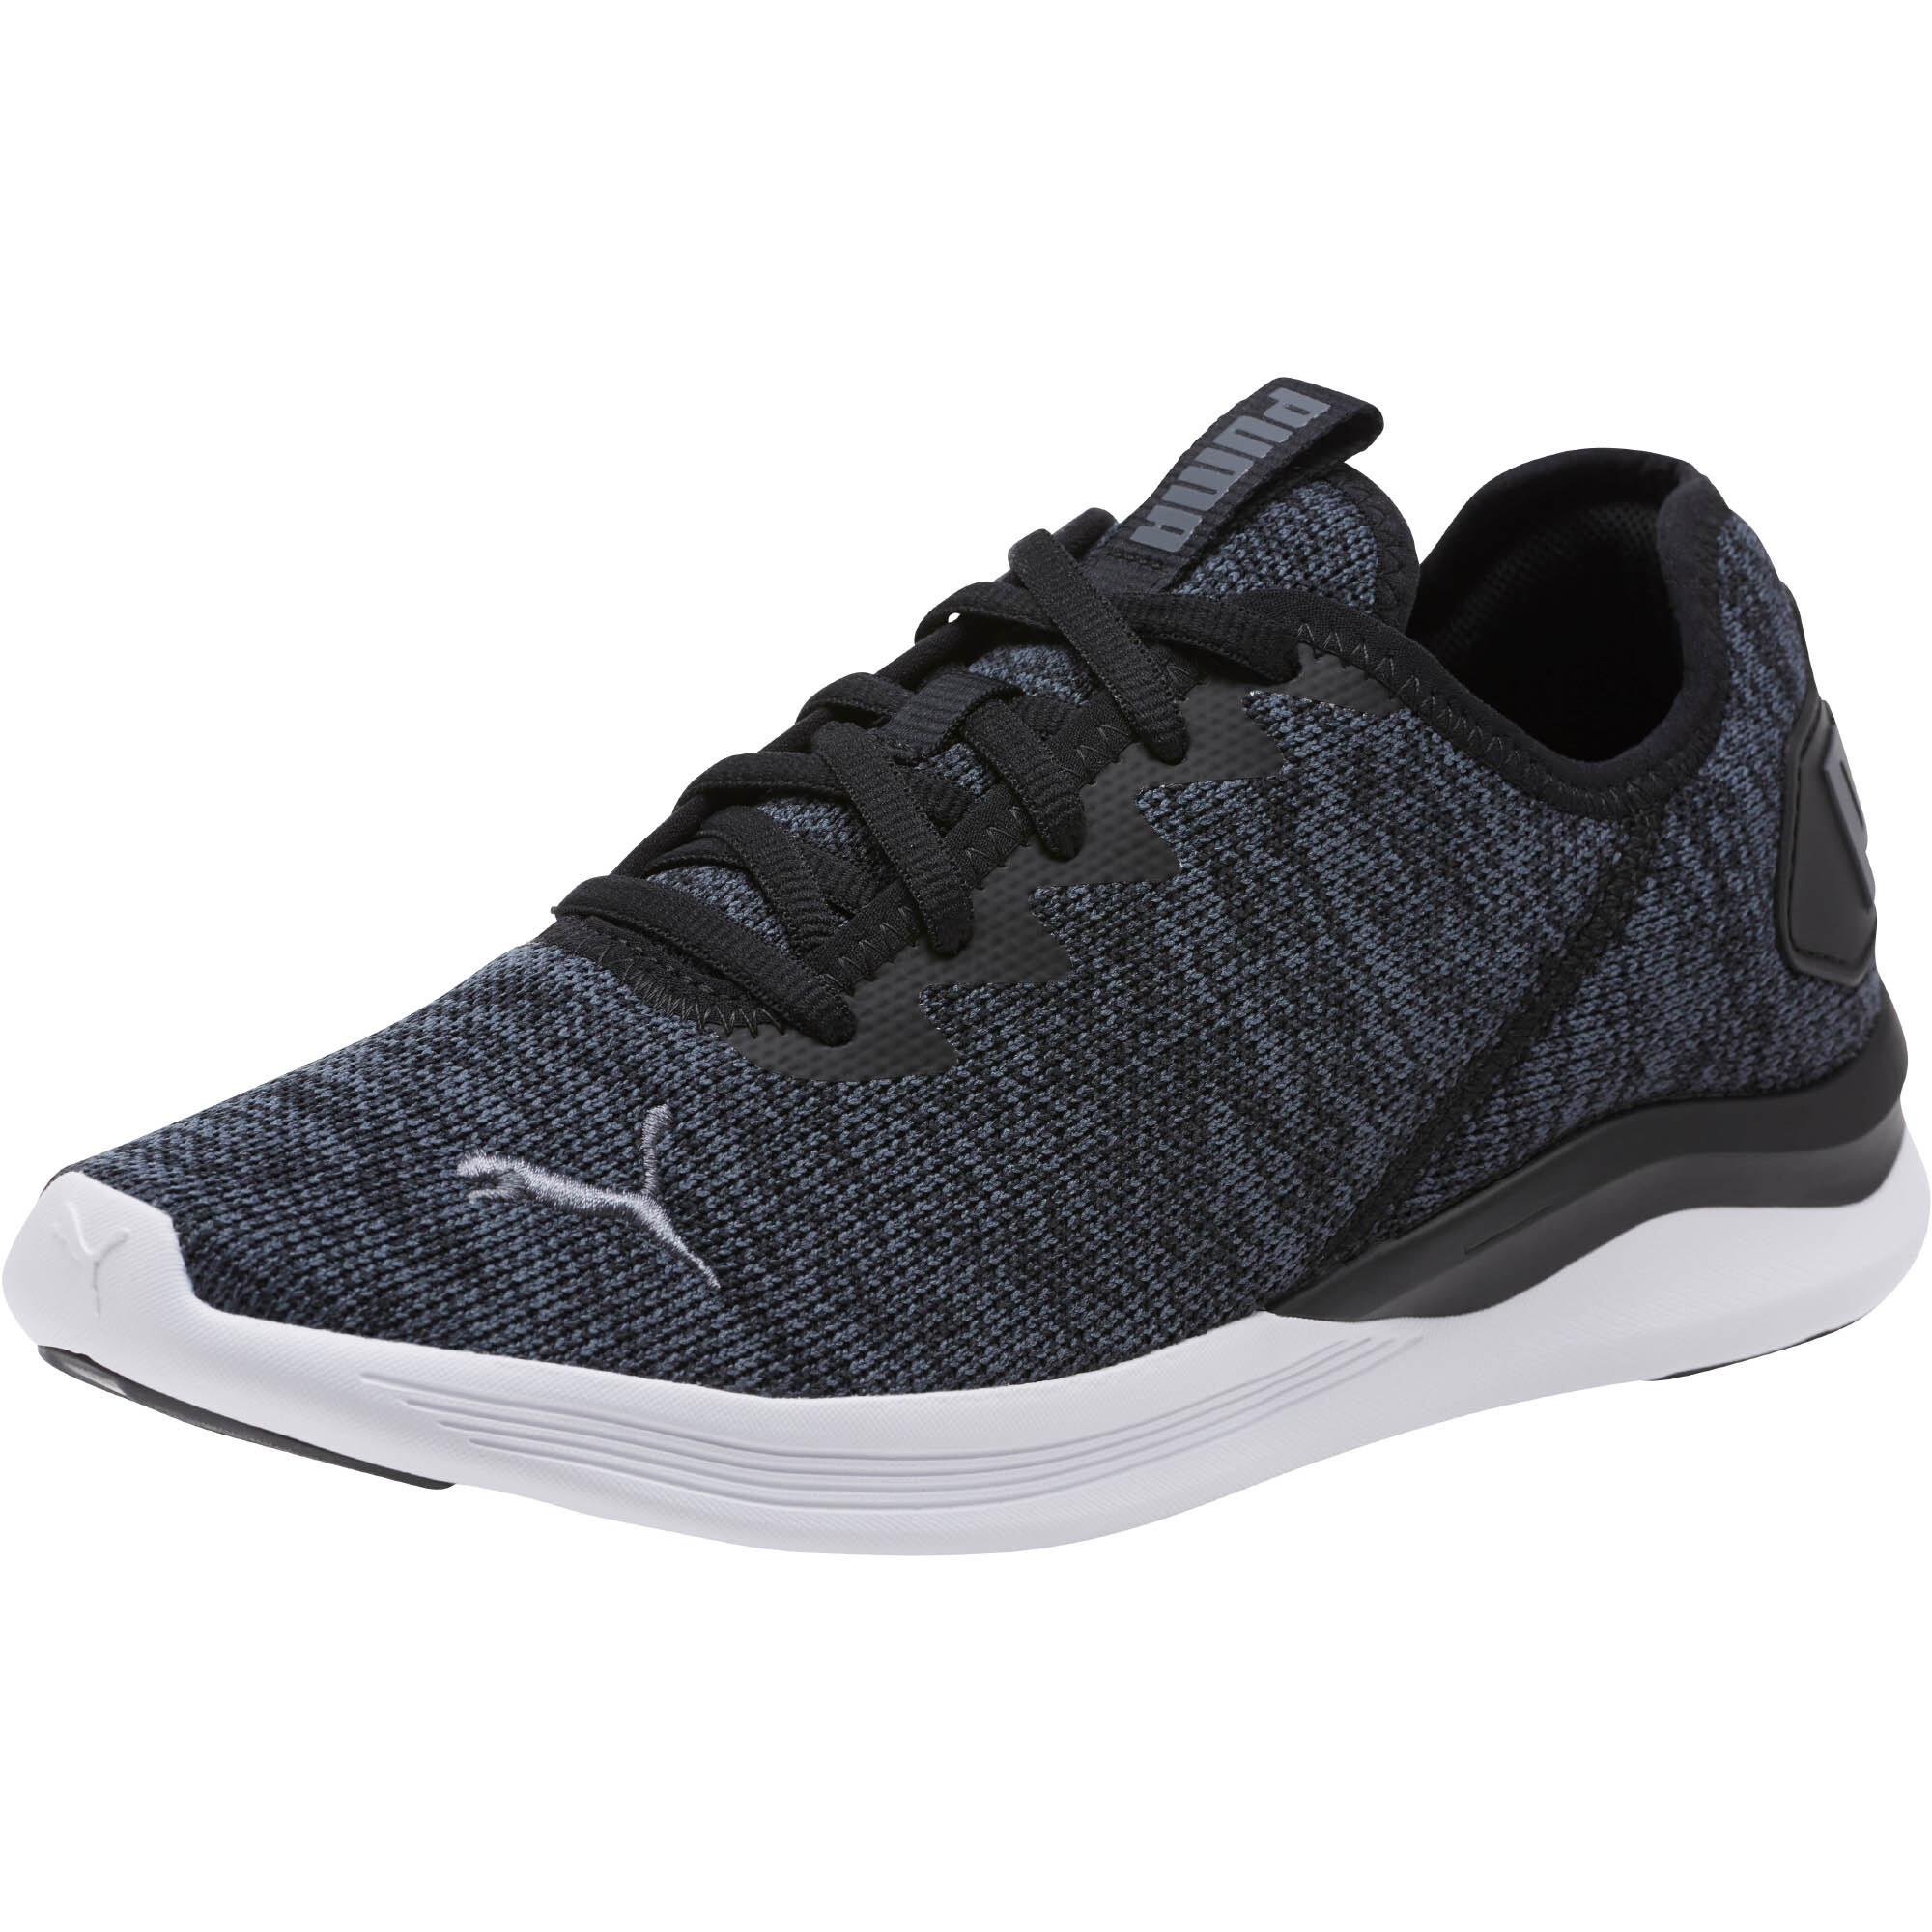 PUMA-Ballast-Women-039-s-Running-Shoes-Women-Shoe-Running thumbnail 4